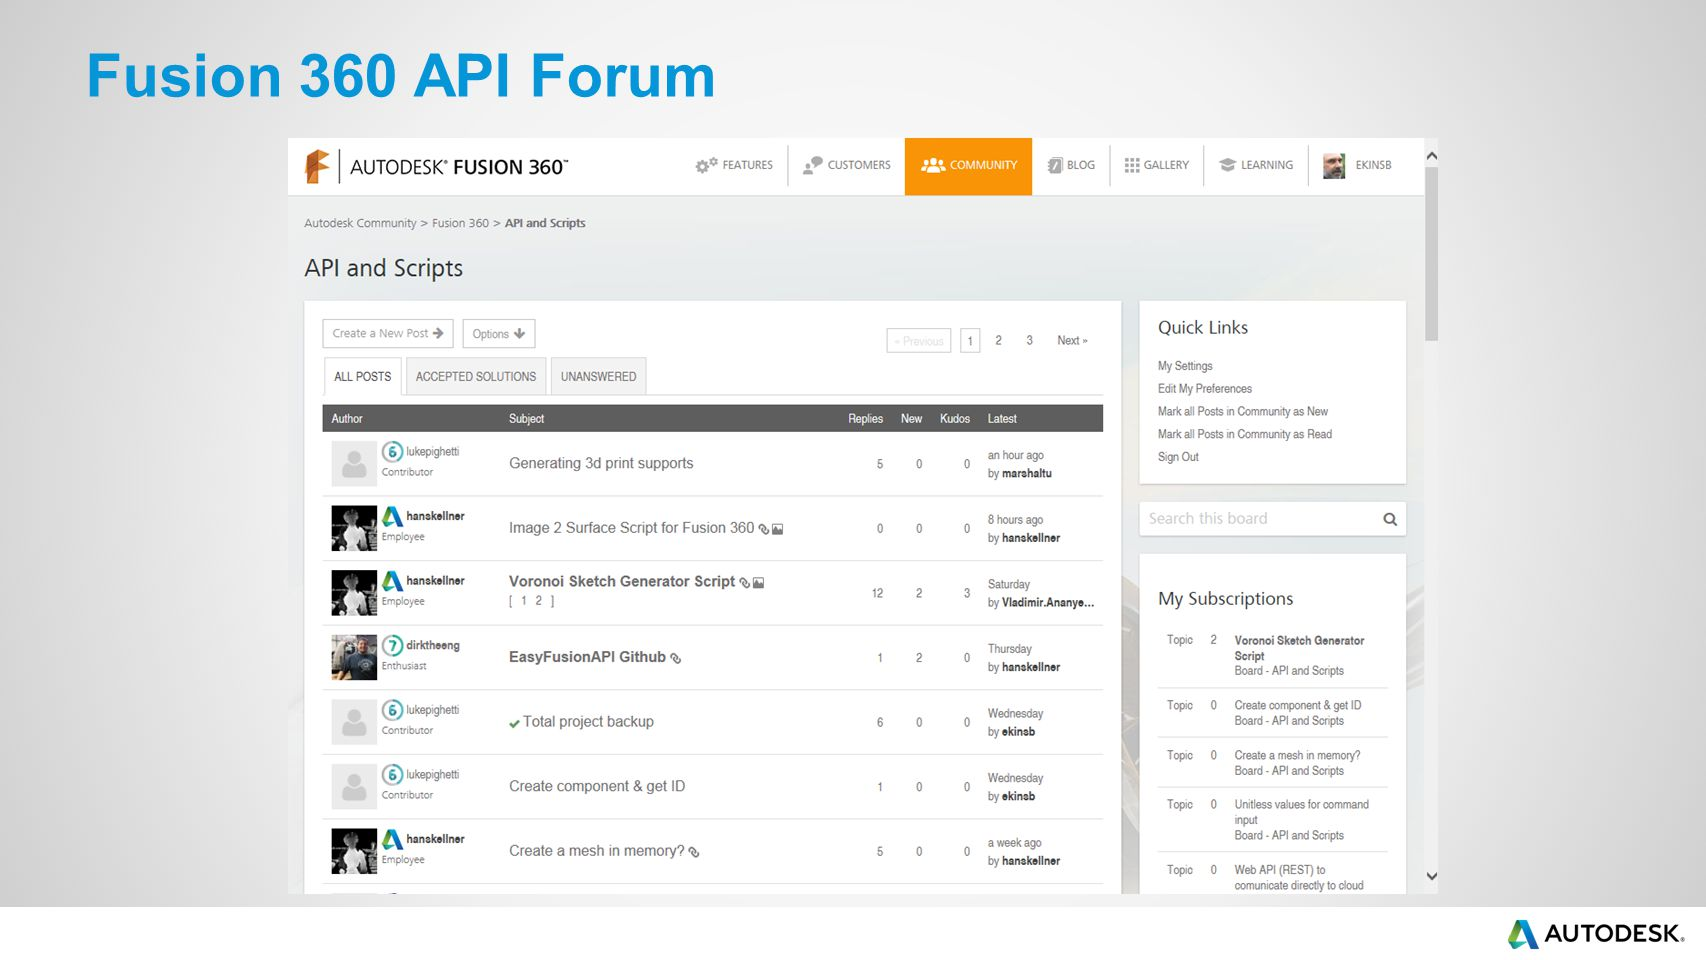 Fusion 360 API Forum